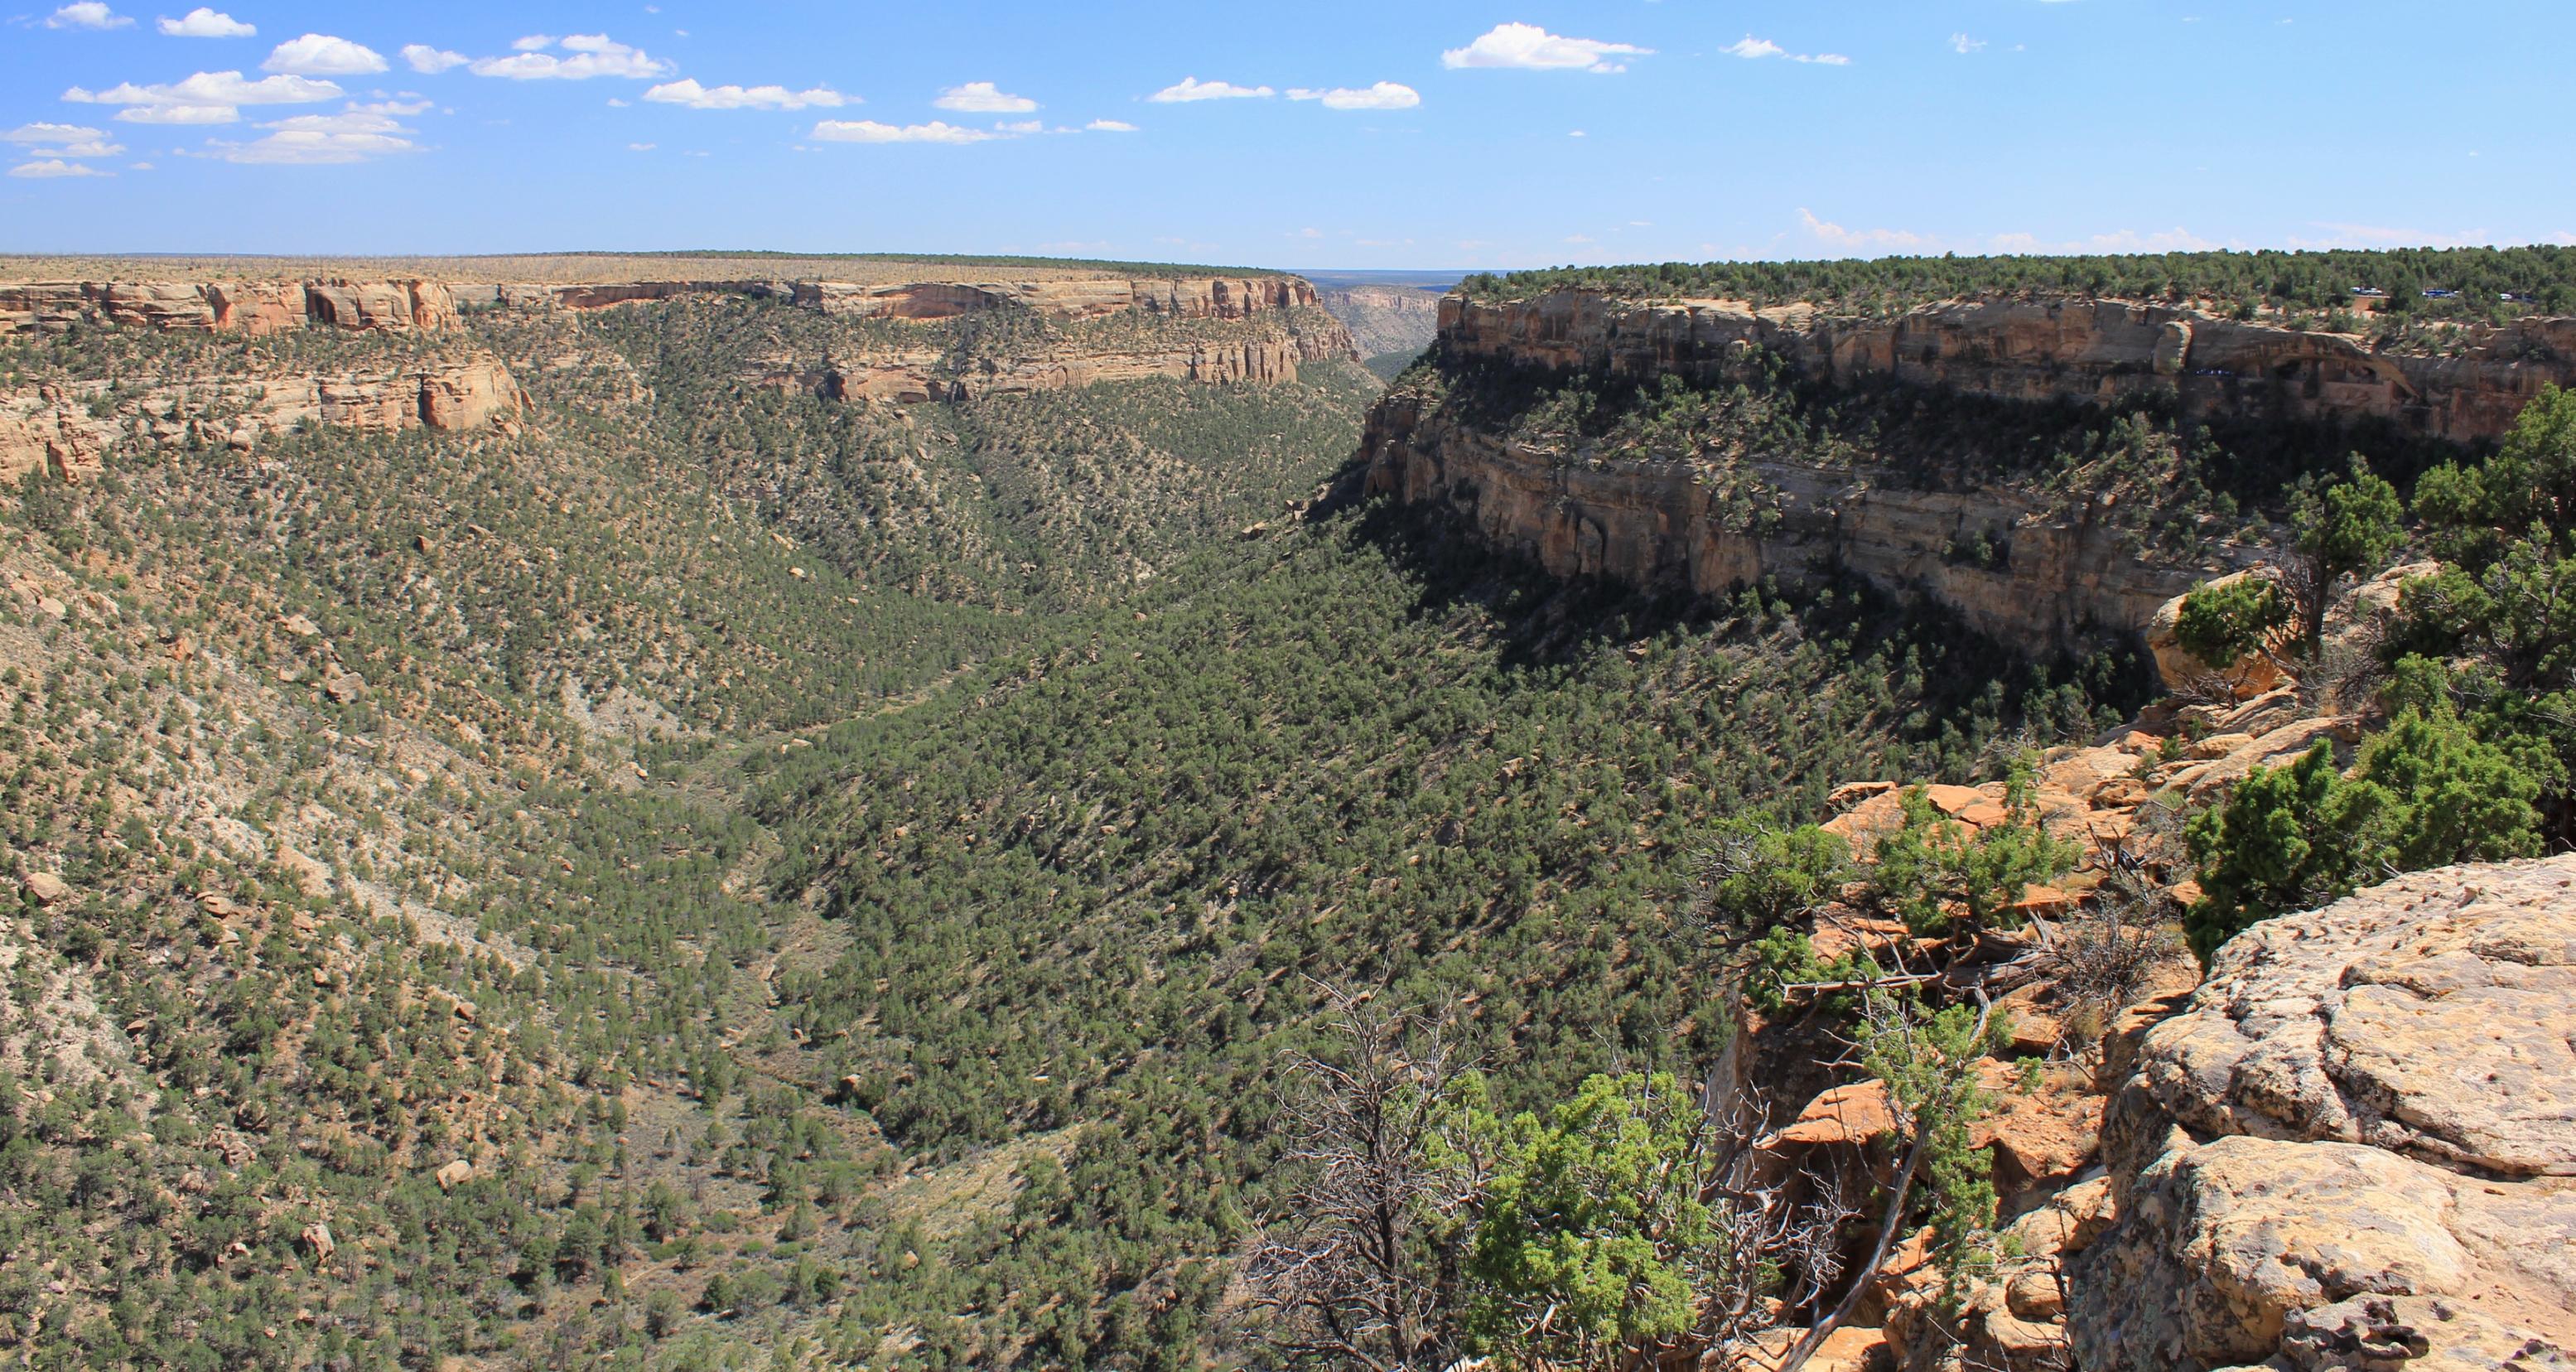 Onto The Green Table Exploring Mesa Verde National Park